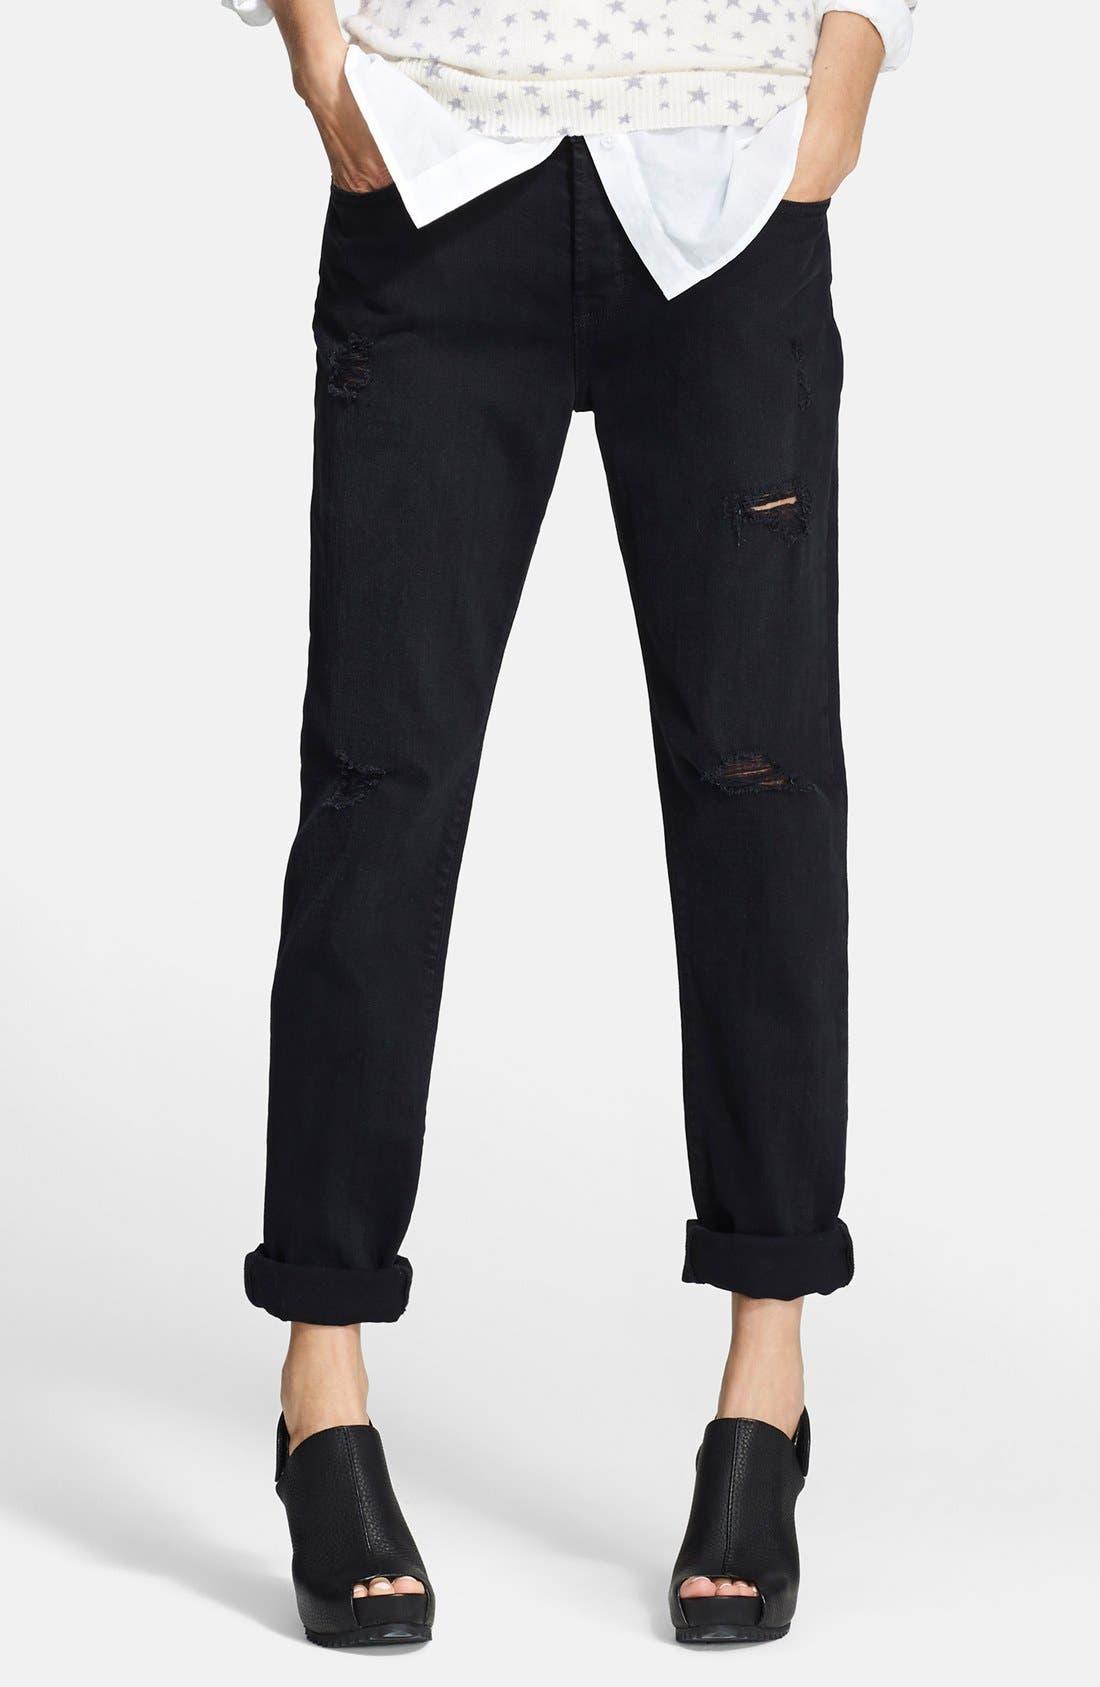 Main Image - Current/Elliott 'The Traveler' Boyfriend Jeans (Black Destroy)